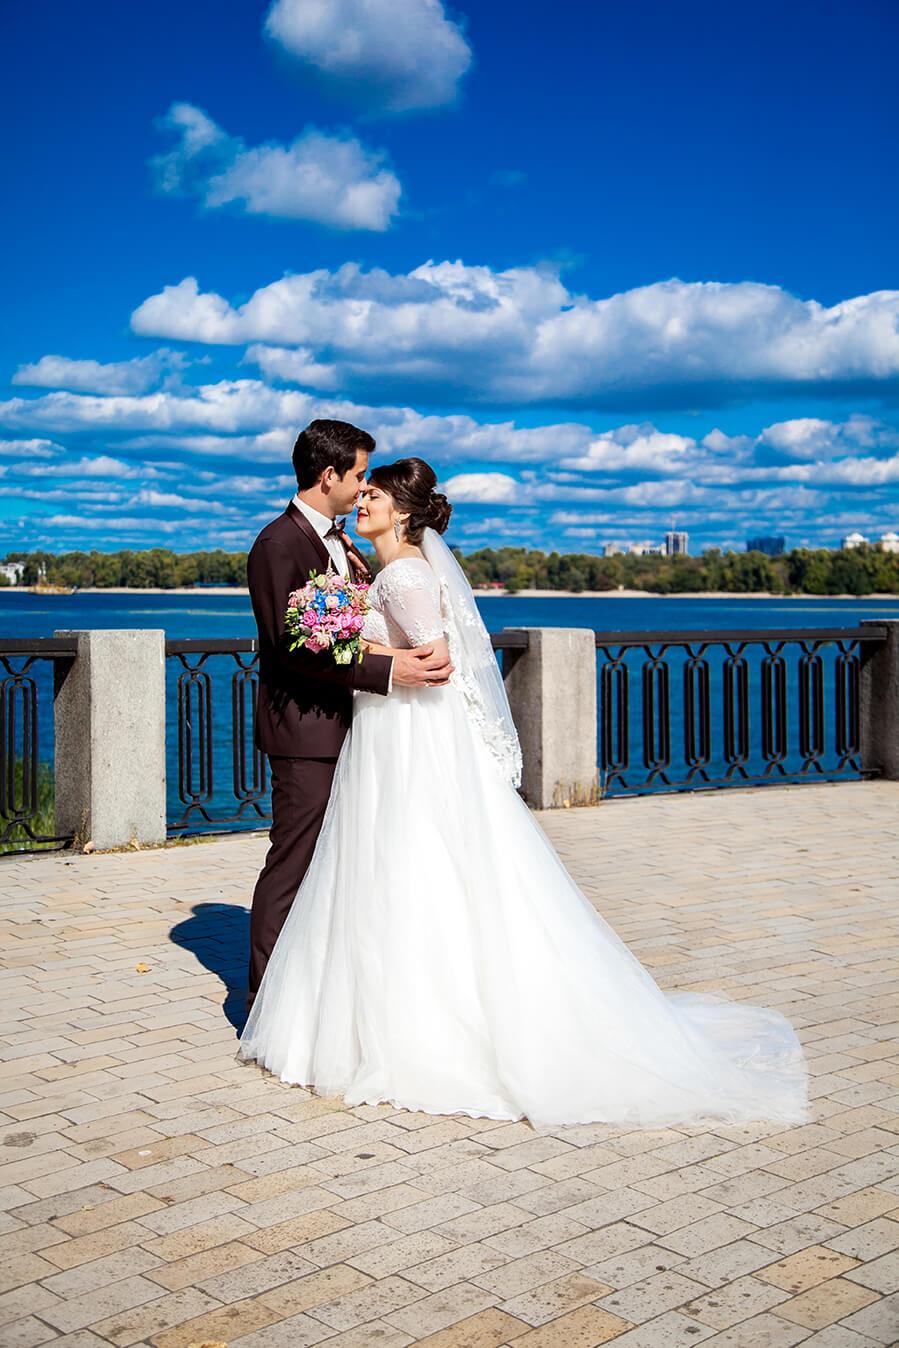 1-svadebnoe-foto-kiev-svadebnaja-progulka-mesta-dlja-svadebnoj-fotosessii-13